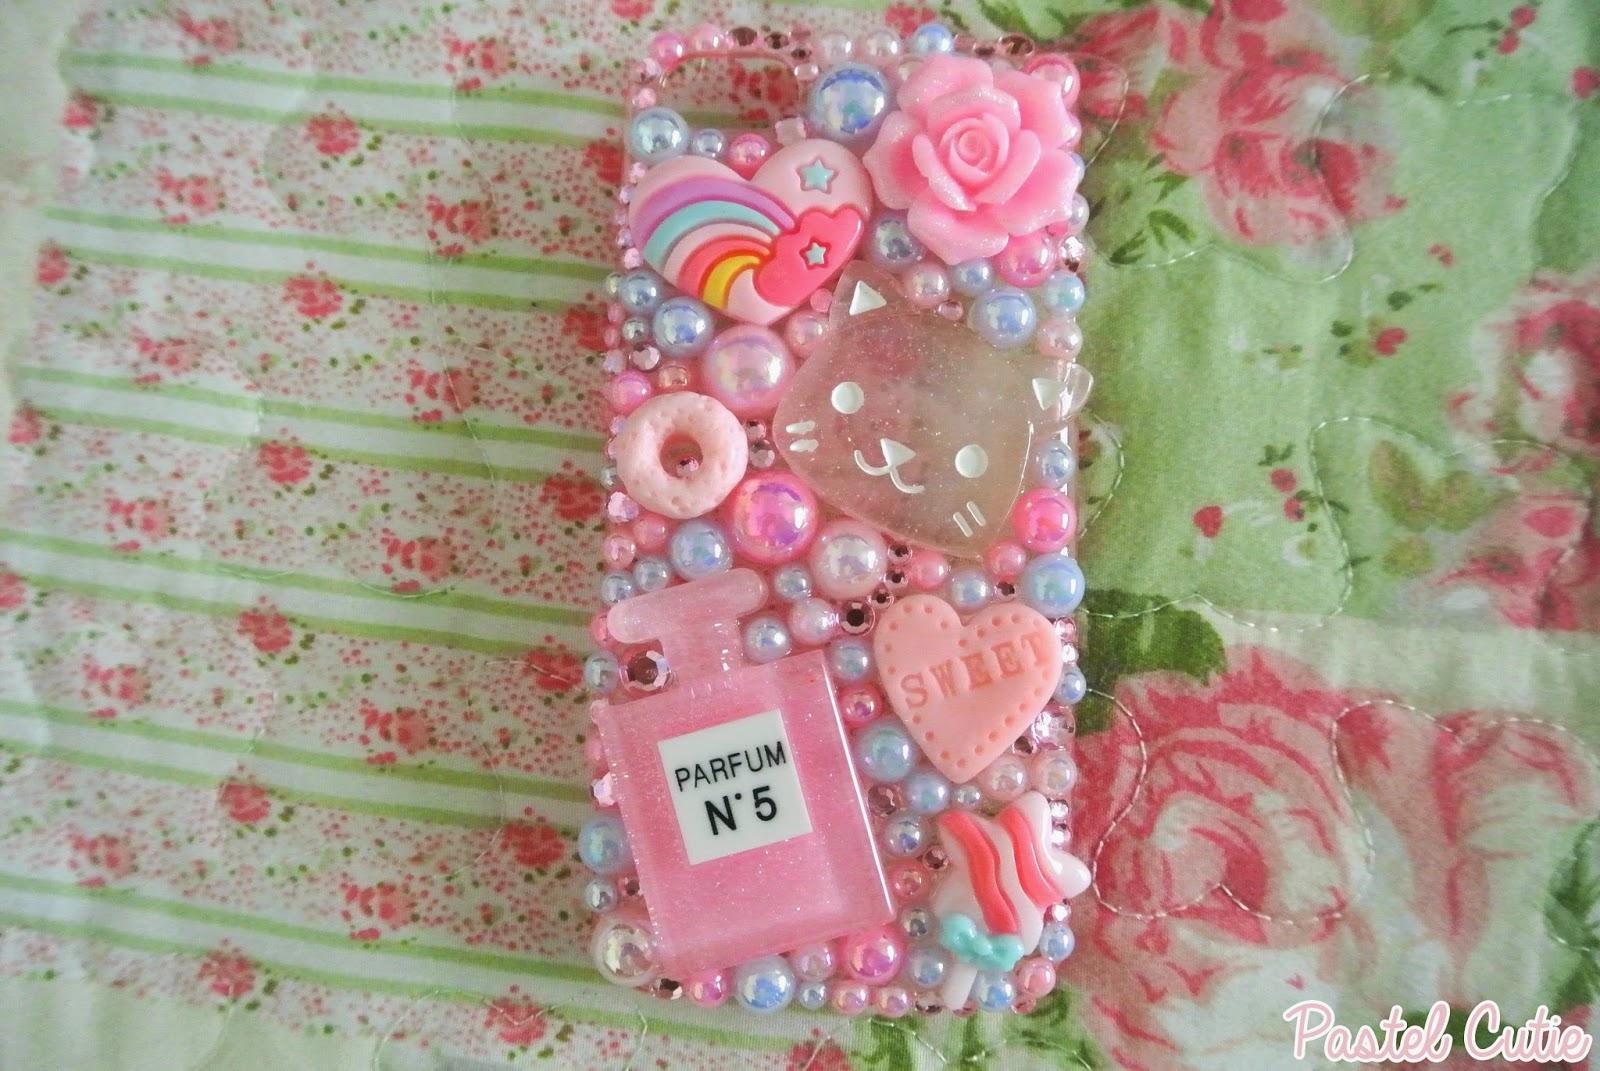 Dreamy ♥ Dollhouse: Sorayraya Kawaii Phone Case Review~! ♥